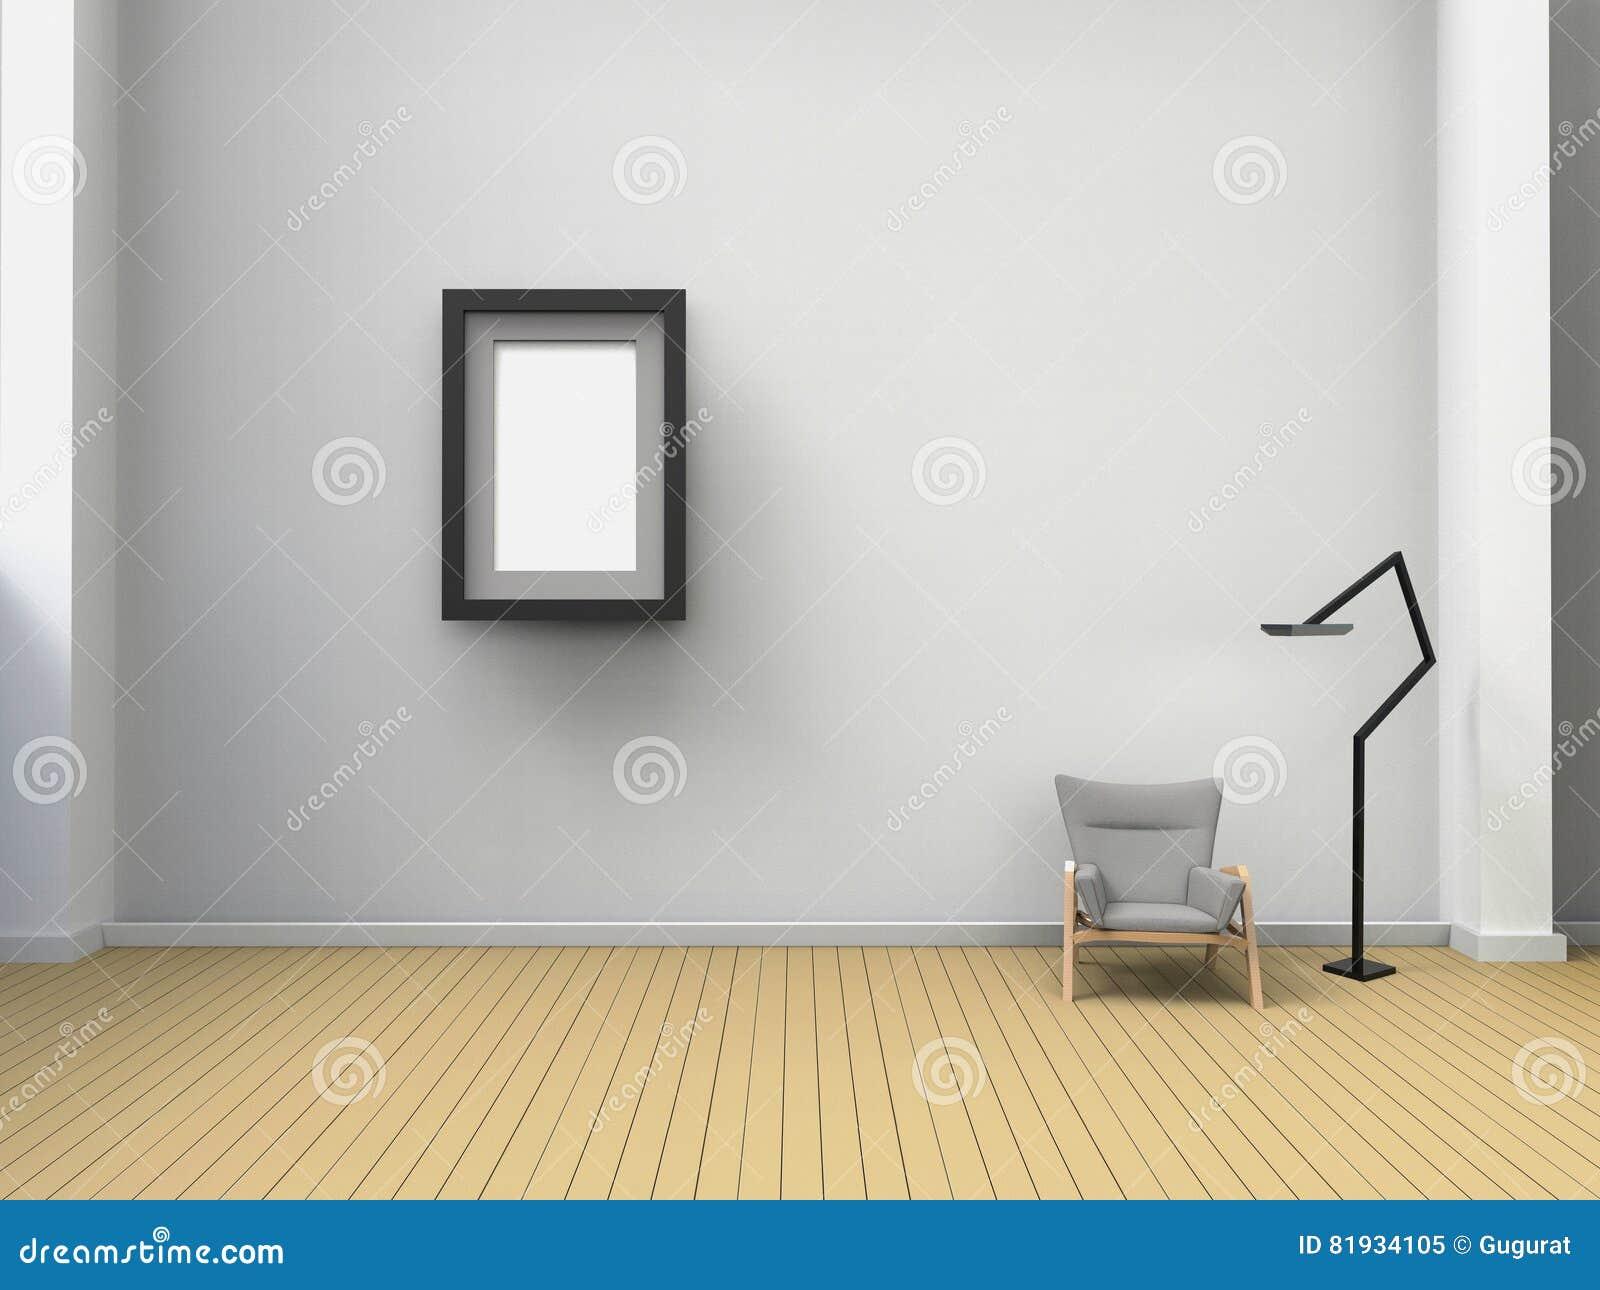 https://thumbs.dreamstime.com/z/woonkamer-art-frame-modern-en-stoelen-witte-muur-en-minimale-stijl-vertoning-galerij-81934105.jpg